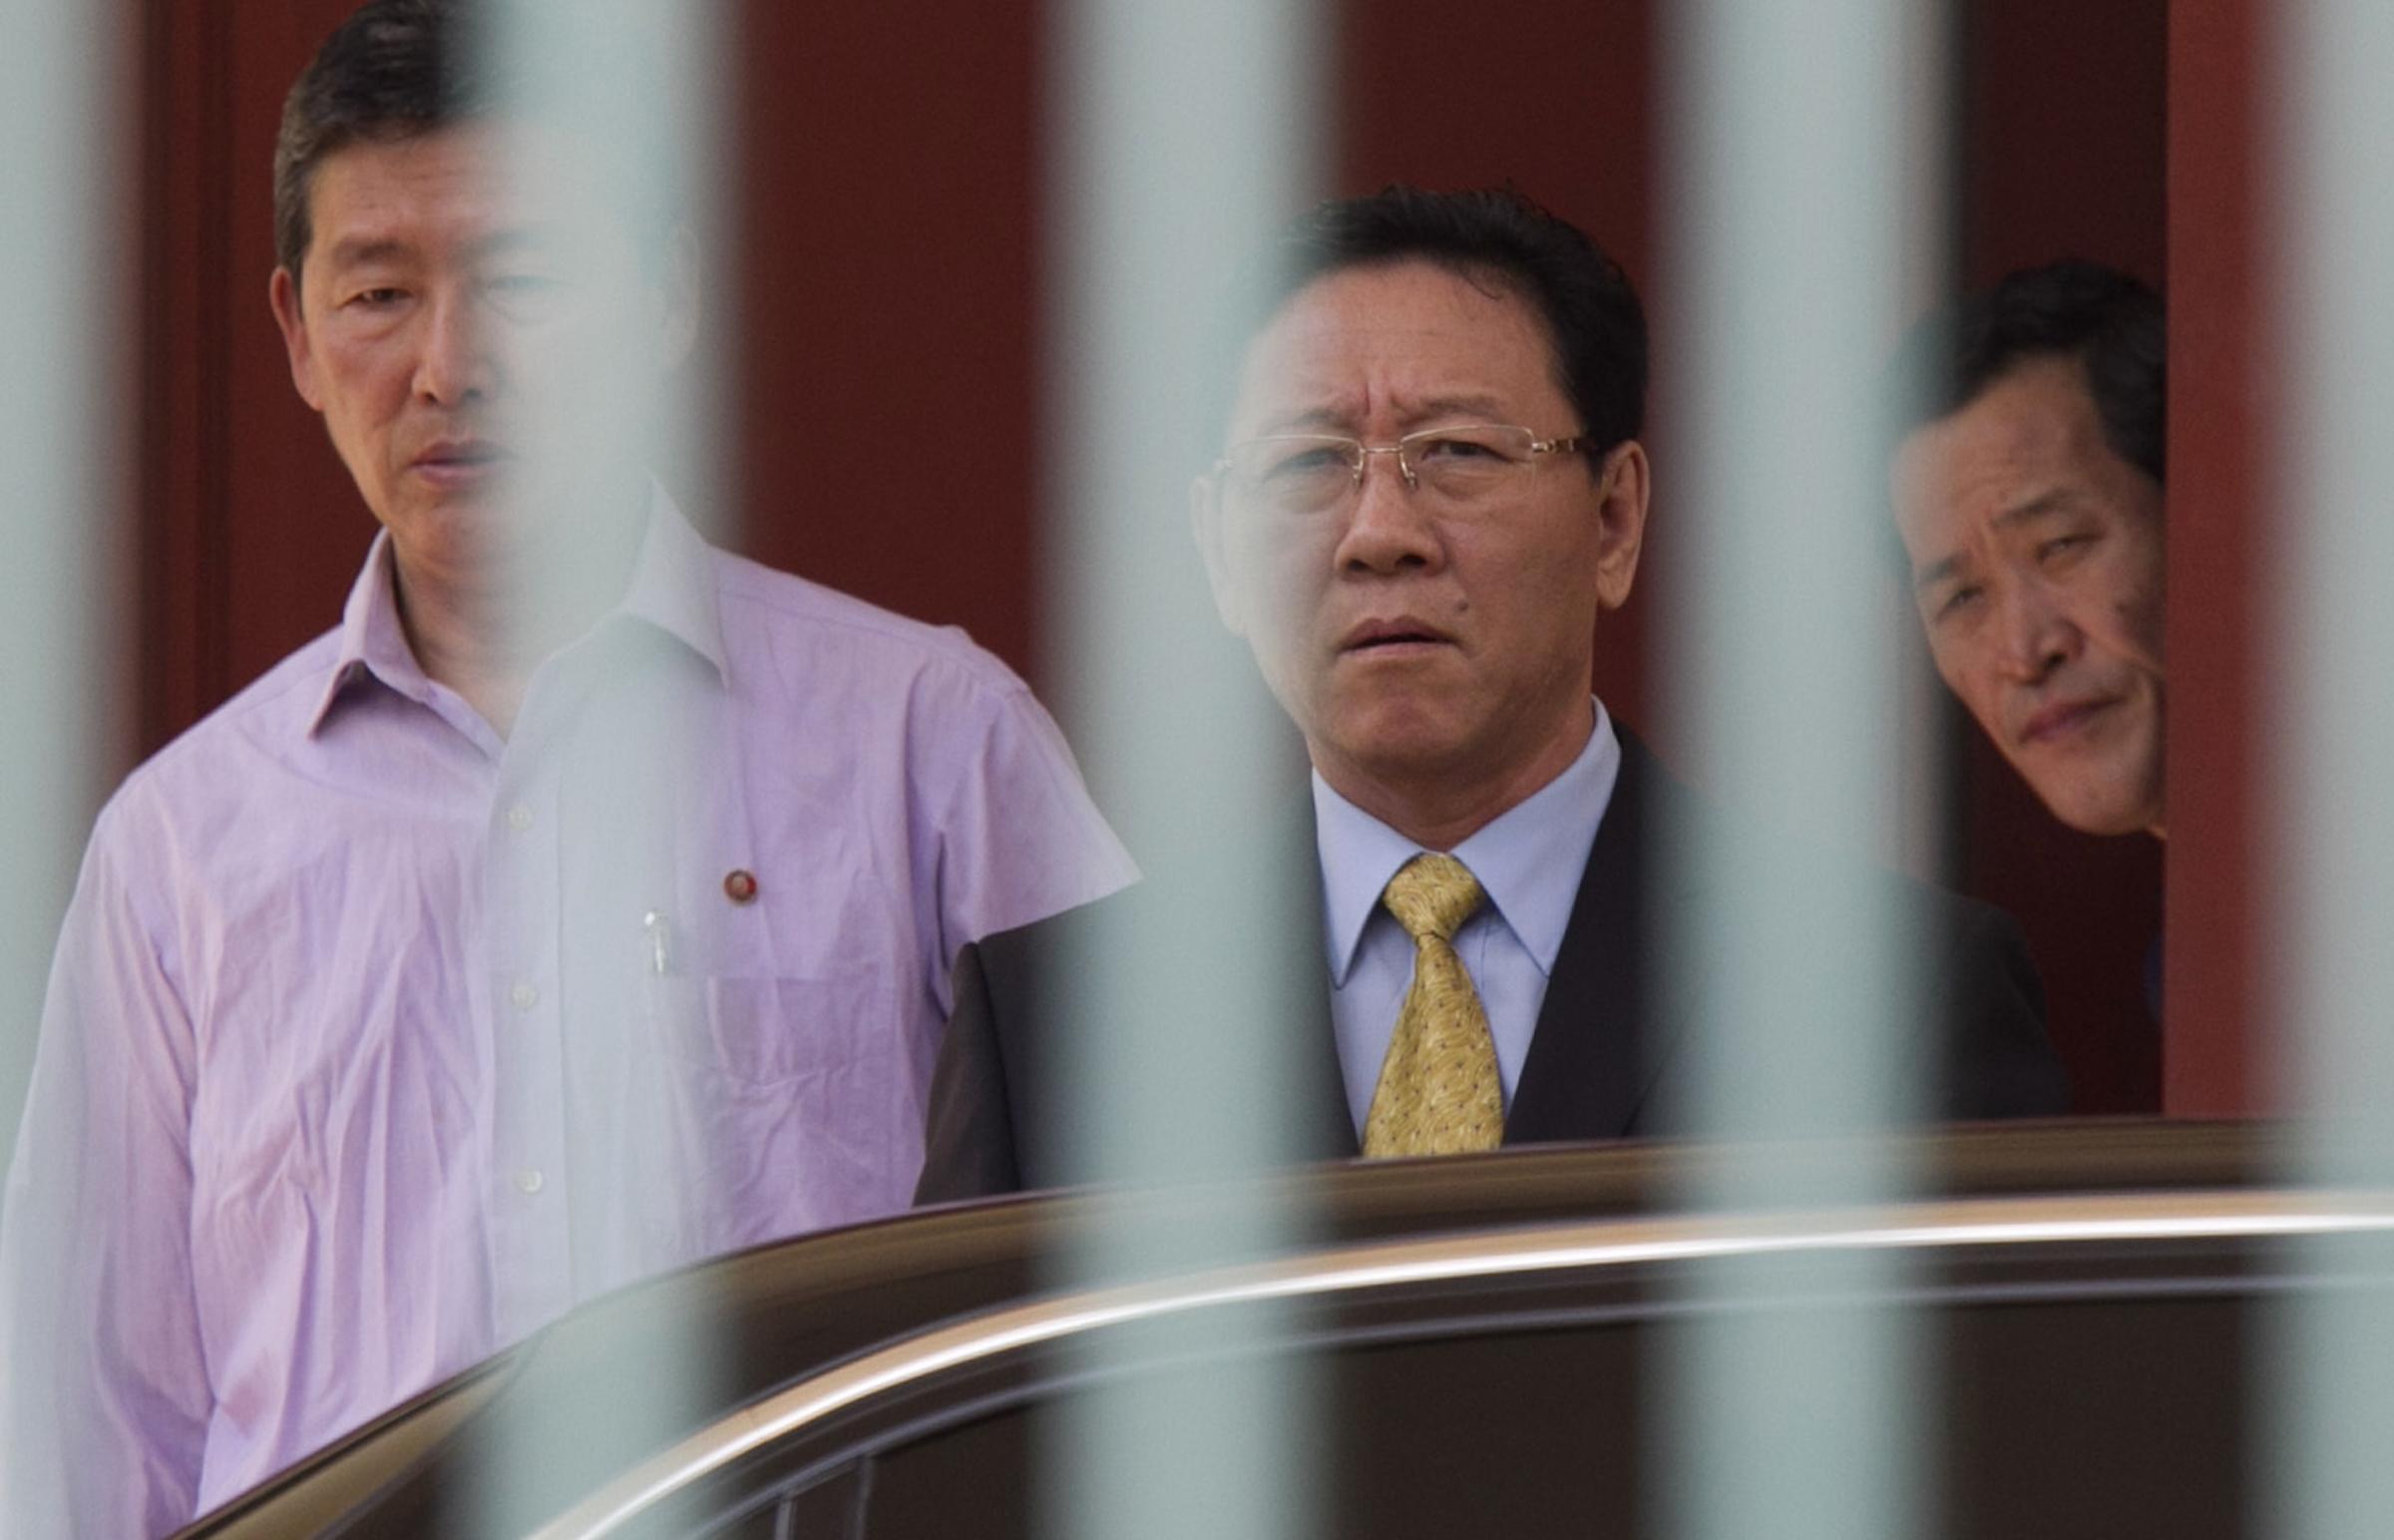 North Korean Ambassador to Malaysia Kang Chol (C) prepares to get on a car at the embassy in Kuala Lumpur, Malaysia on March 6, 2017. (AP Photo/Daniel Chan)